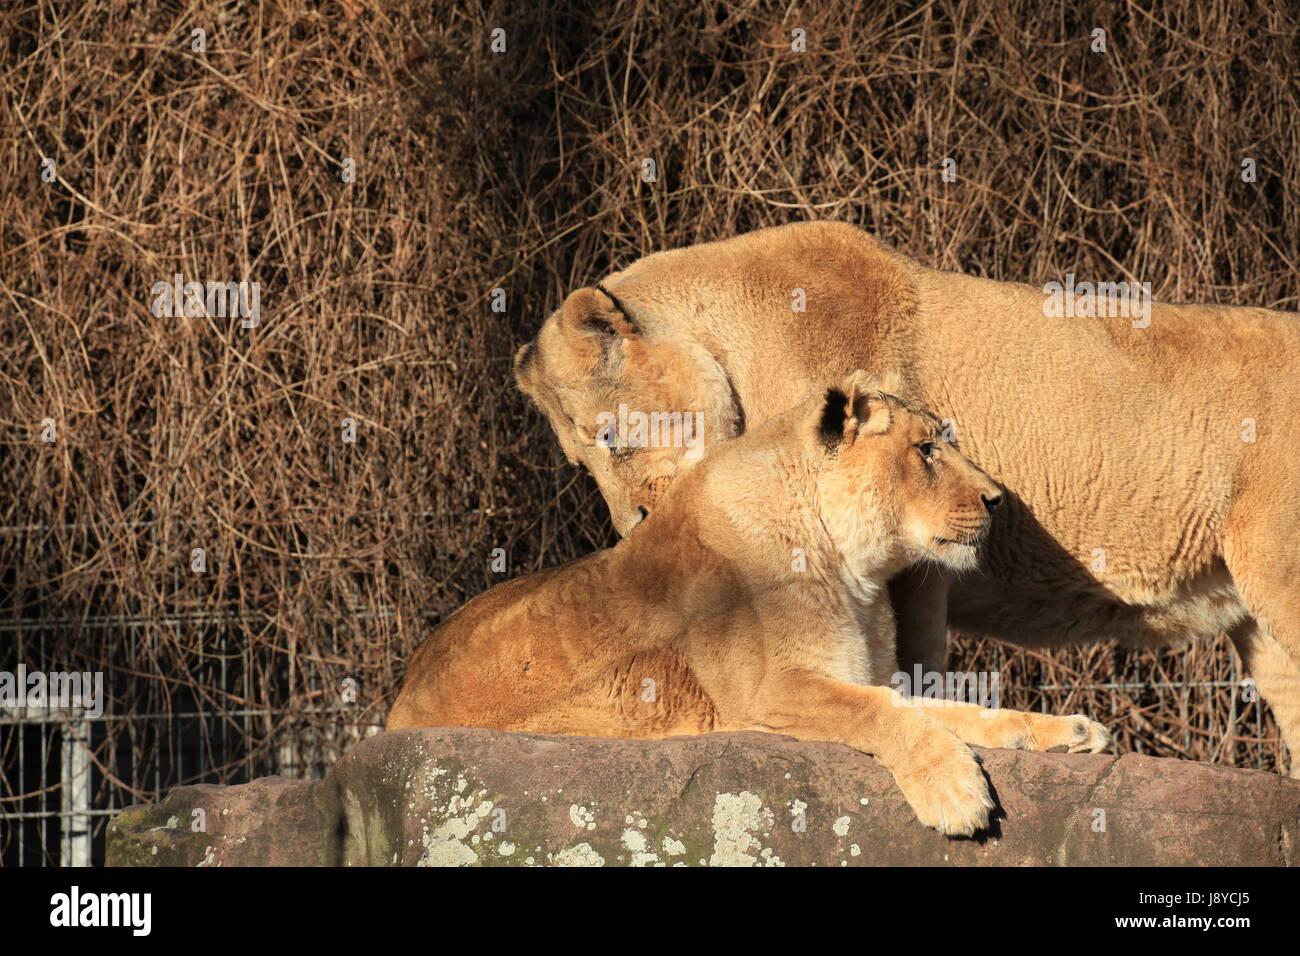 mammal, lion, cat, big cat, feline predator, skin, predator, lioness, head, Stock Photo